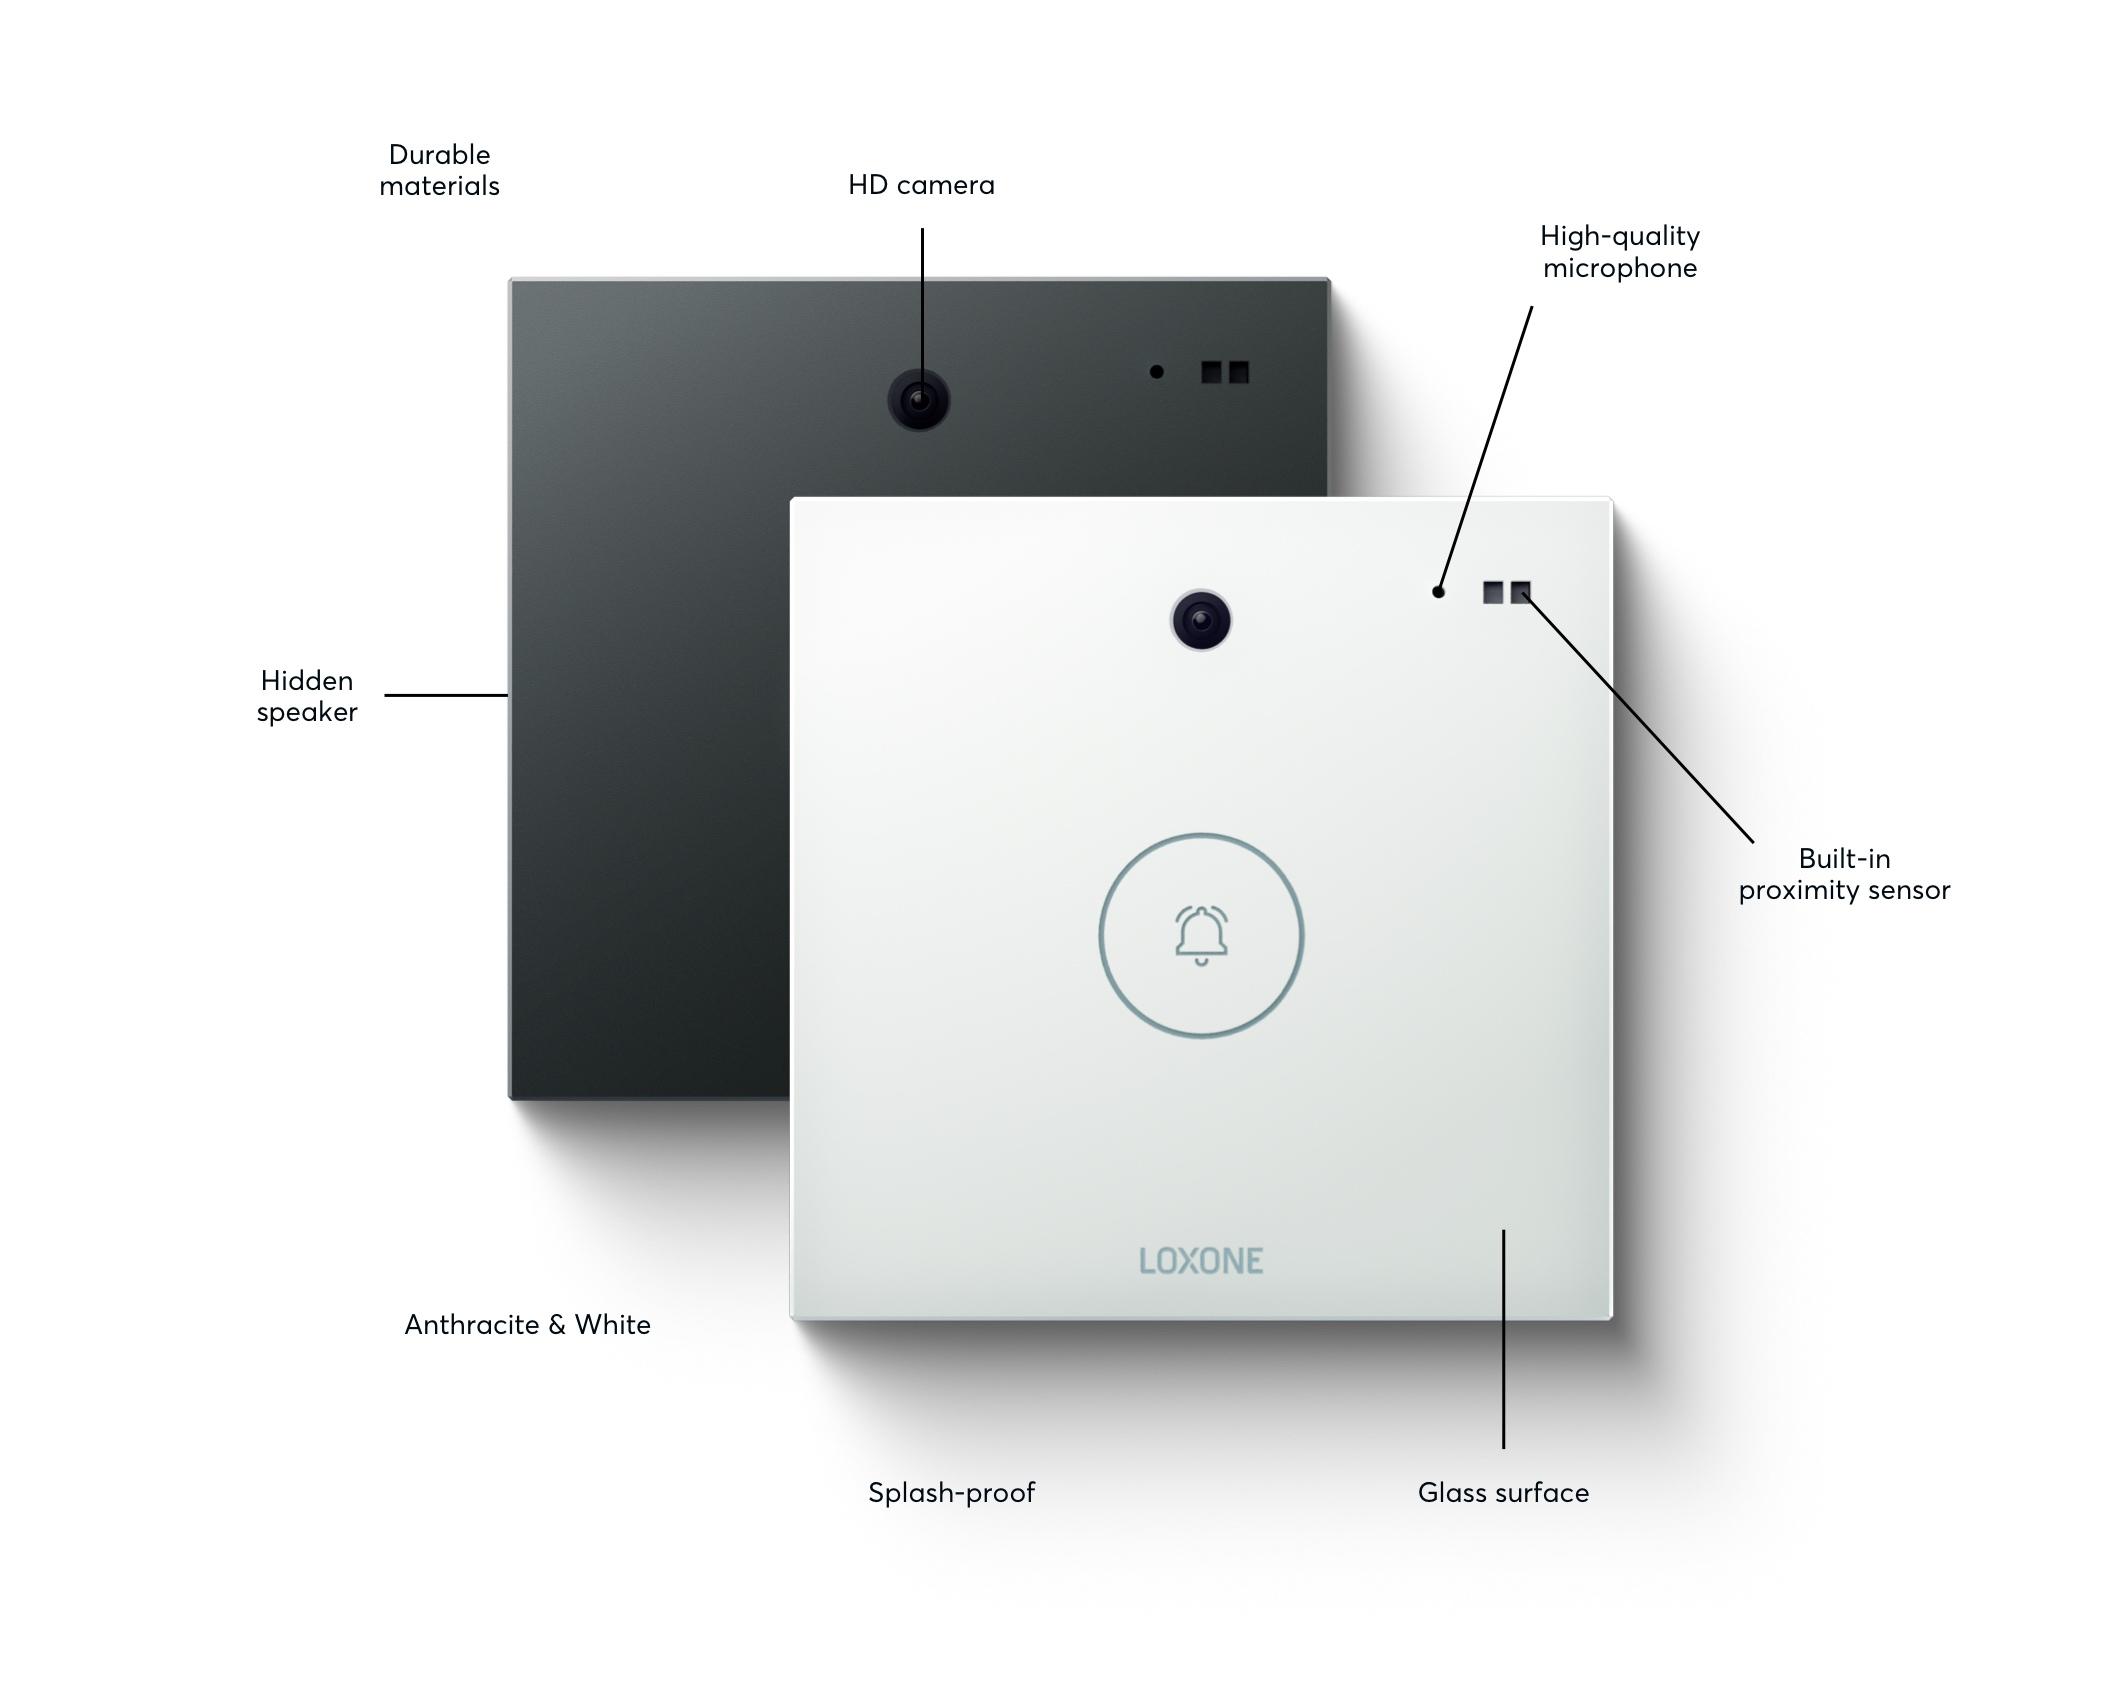 Intercom features